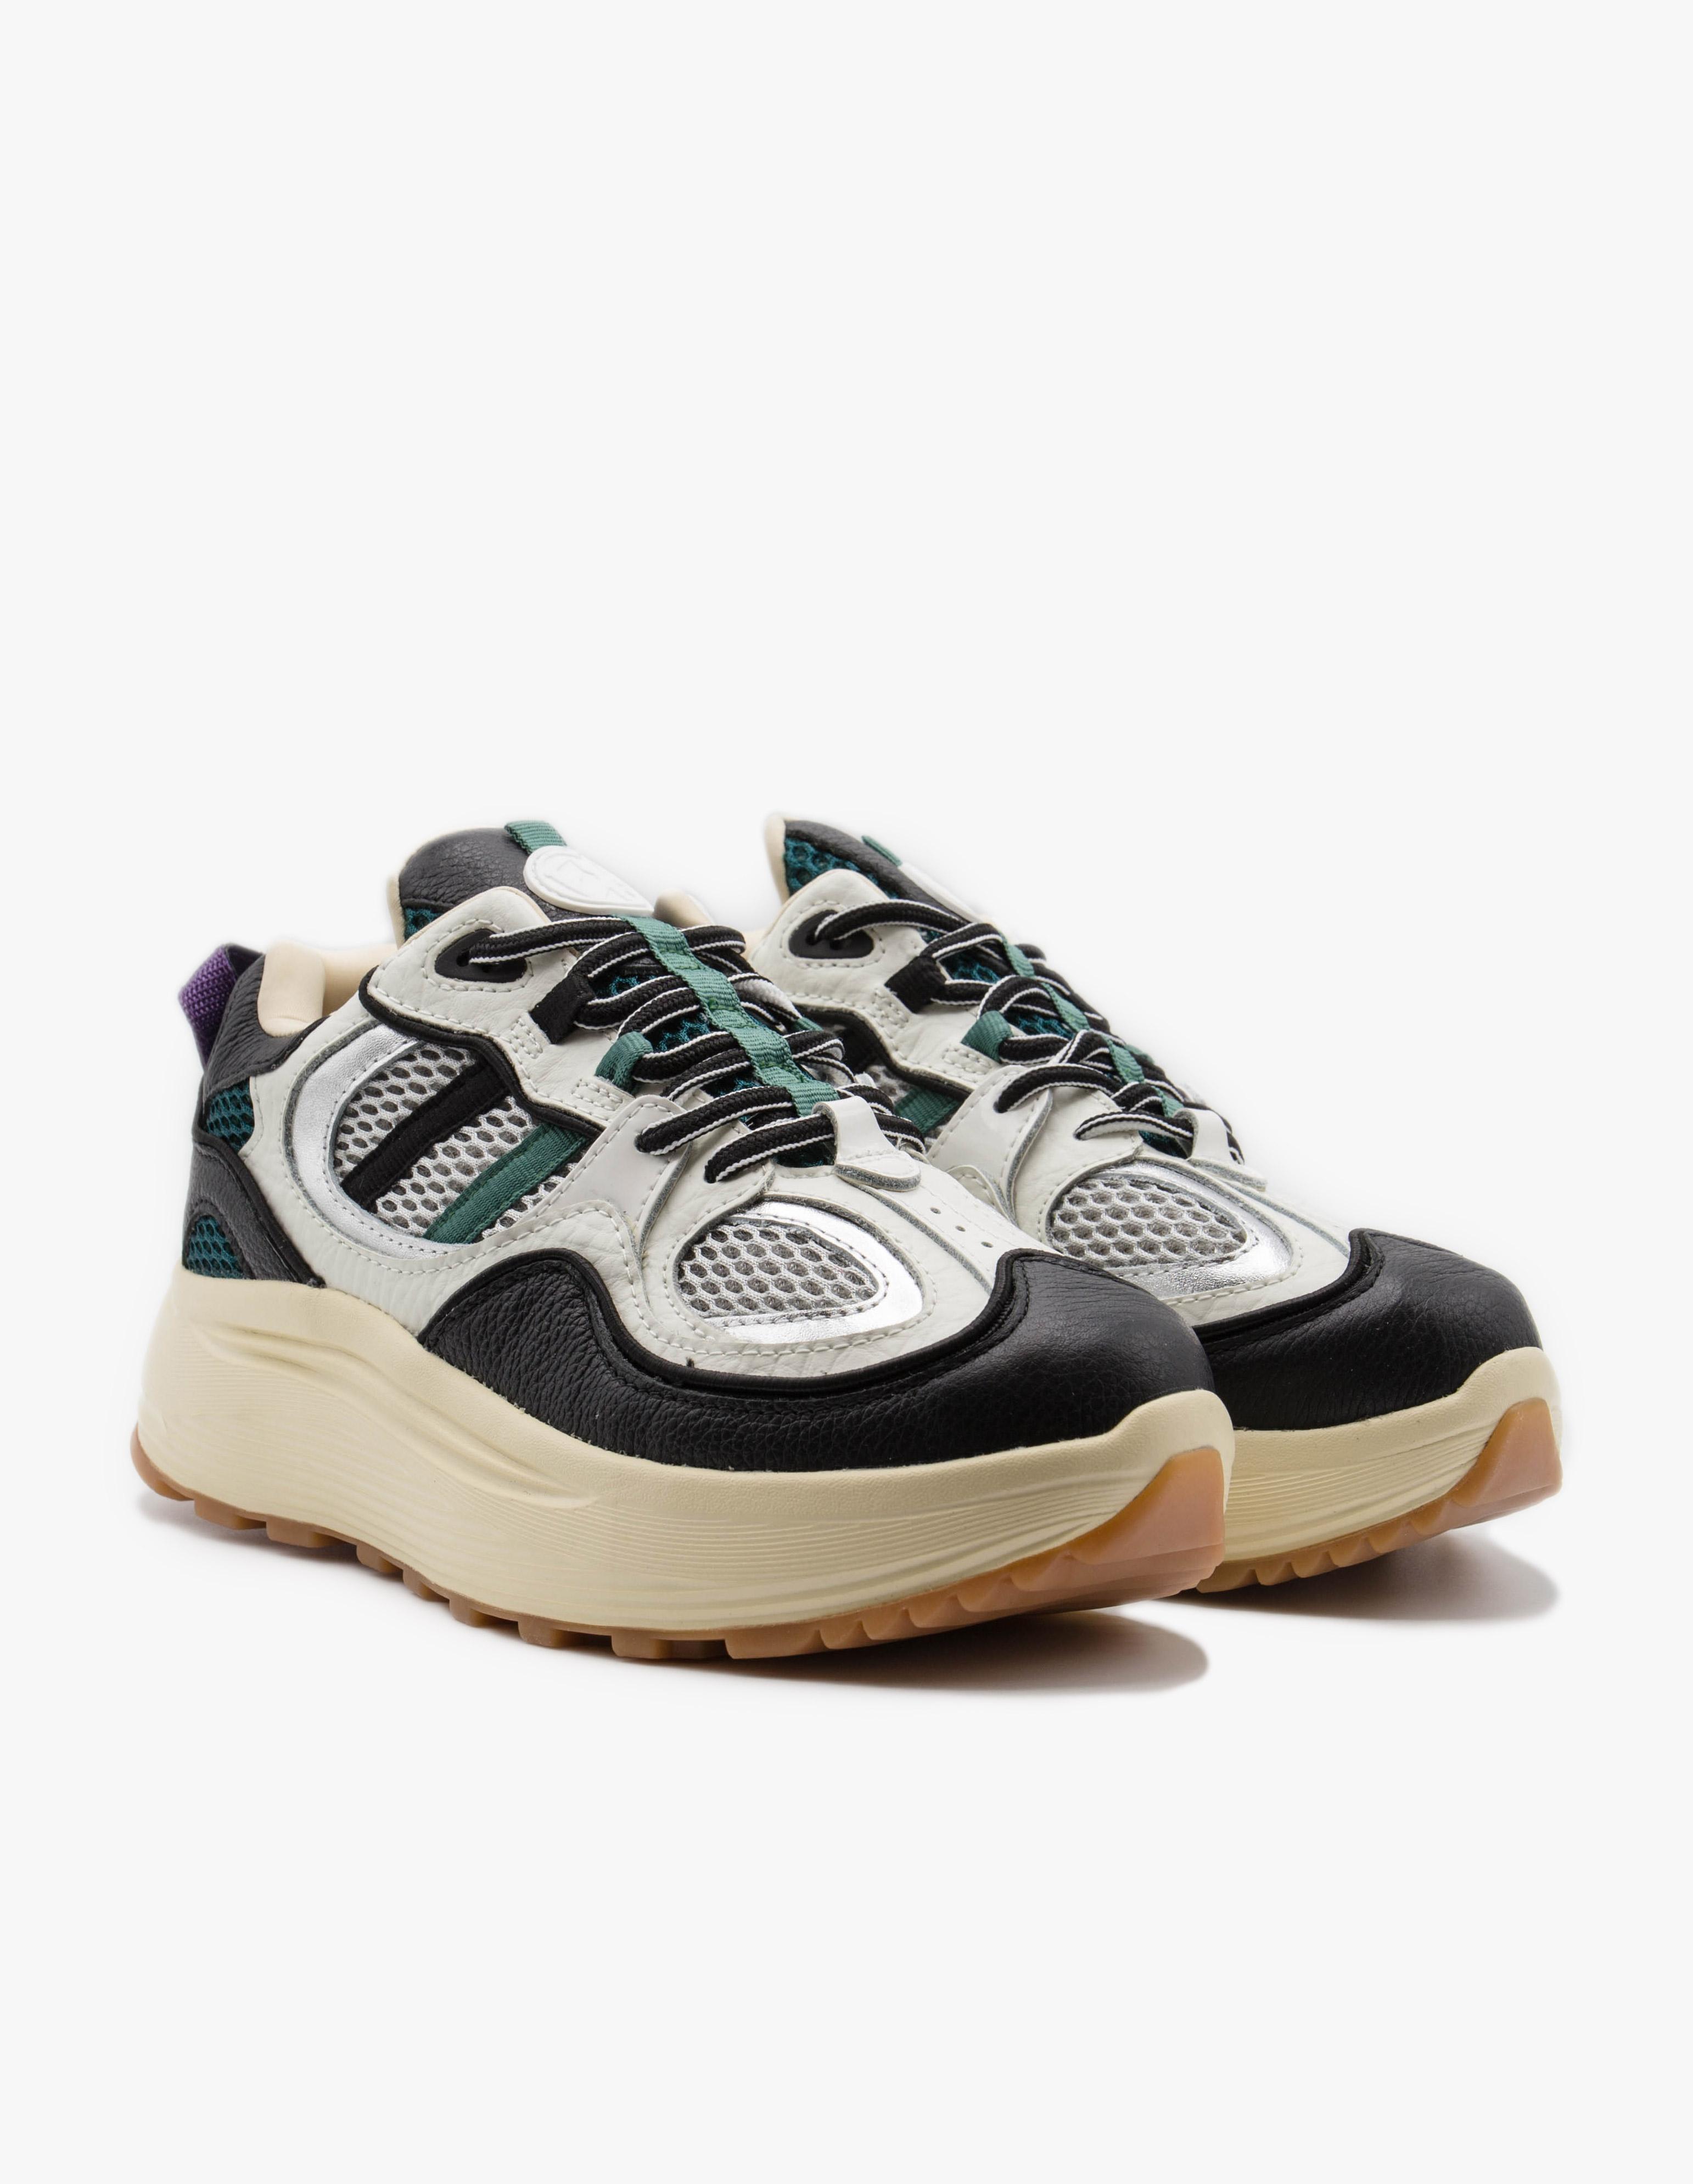 mizuno womens volleyball shoes size 8 x 1 jordan almond zip